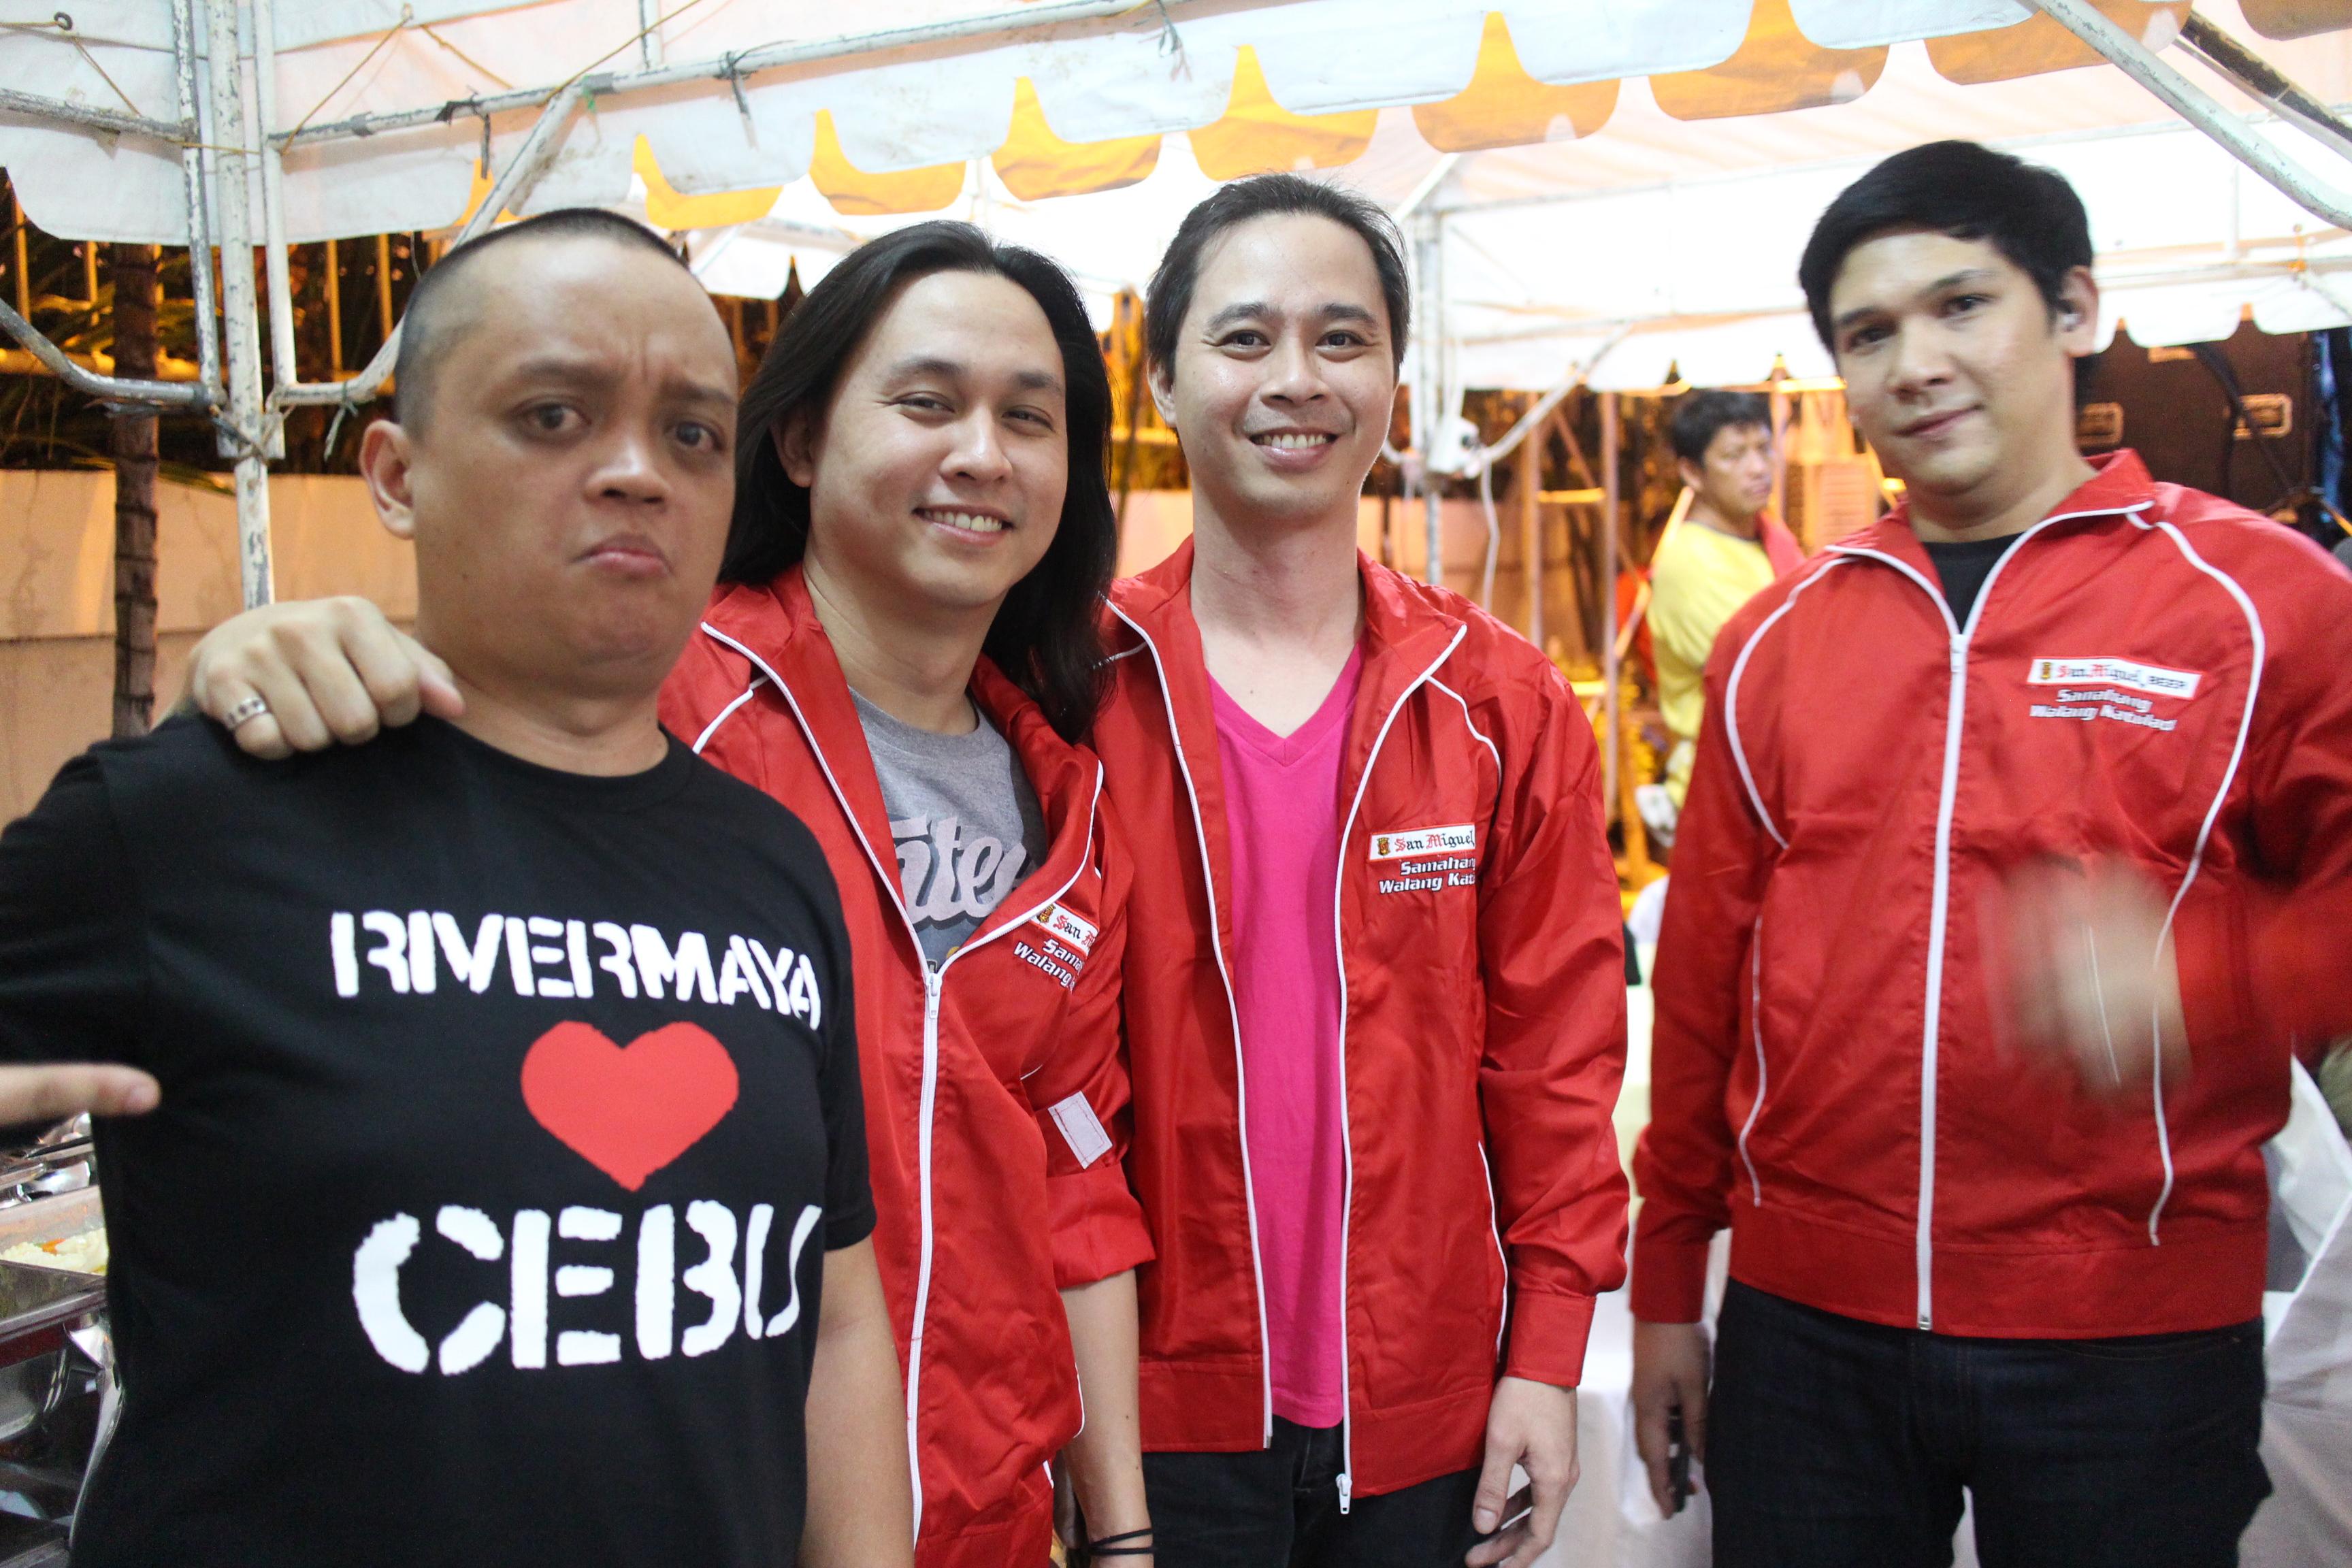 PHOTOS: Catching Up With Rivermaya band in Cebu